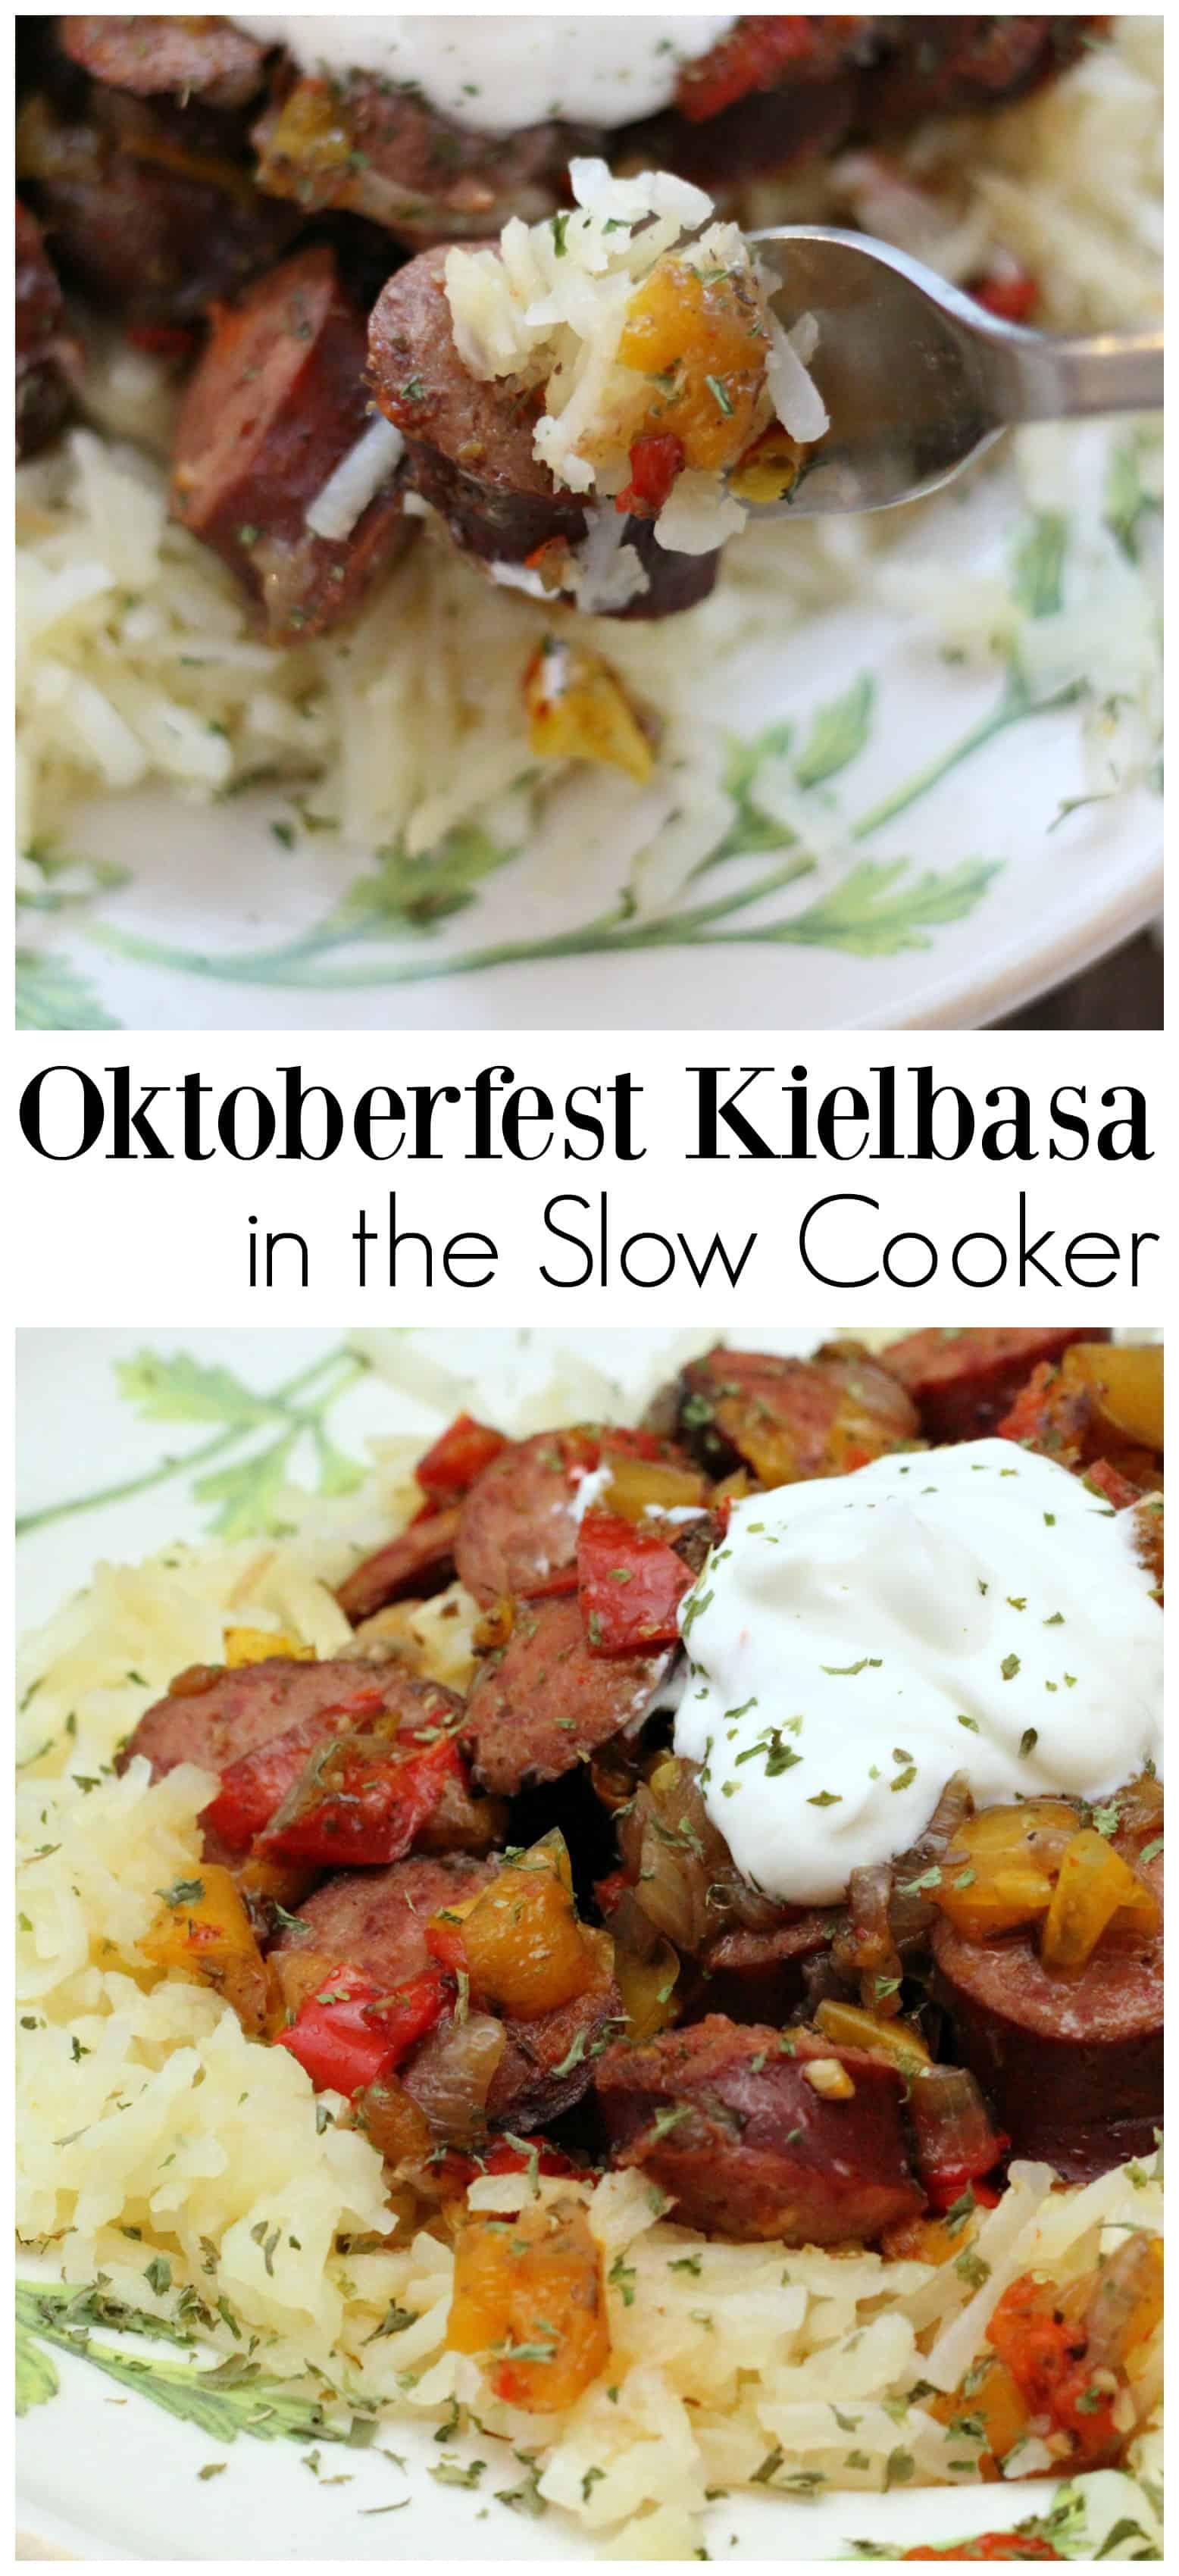 Slow Cooker Oktoberfest Kielbasa